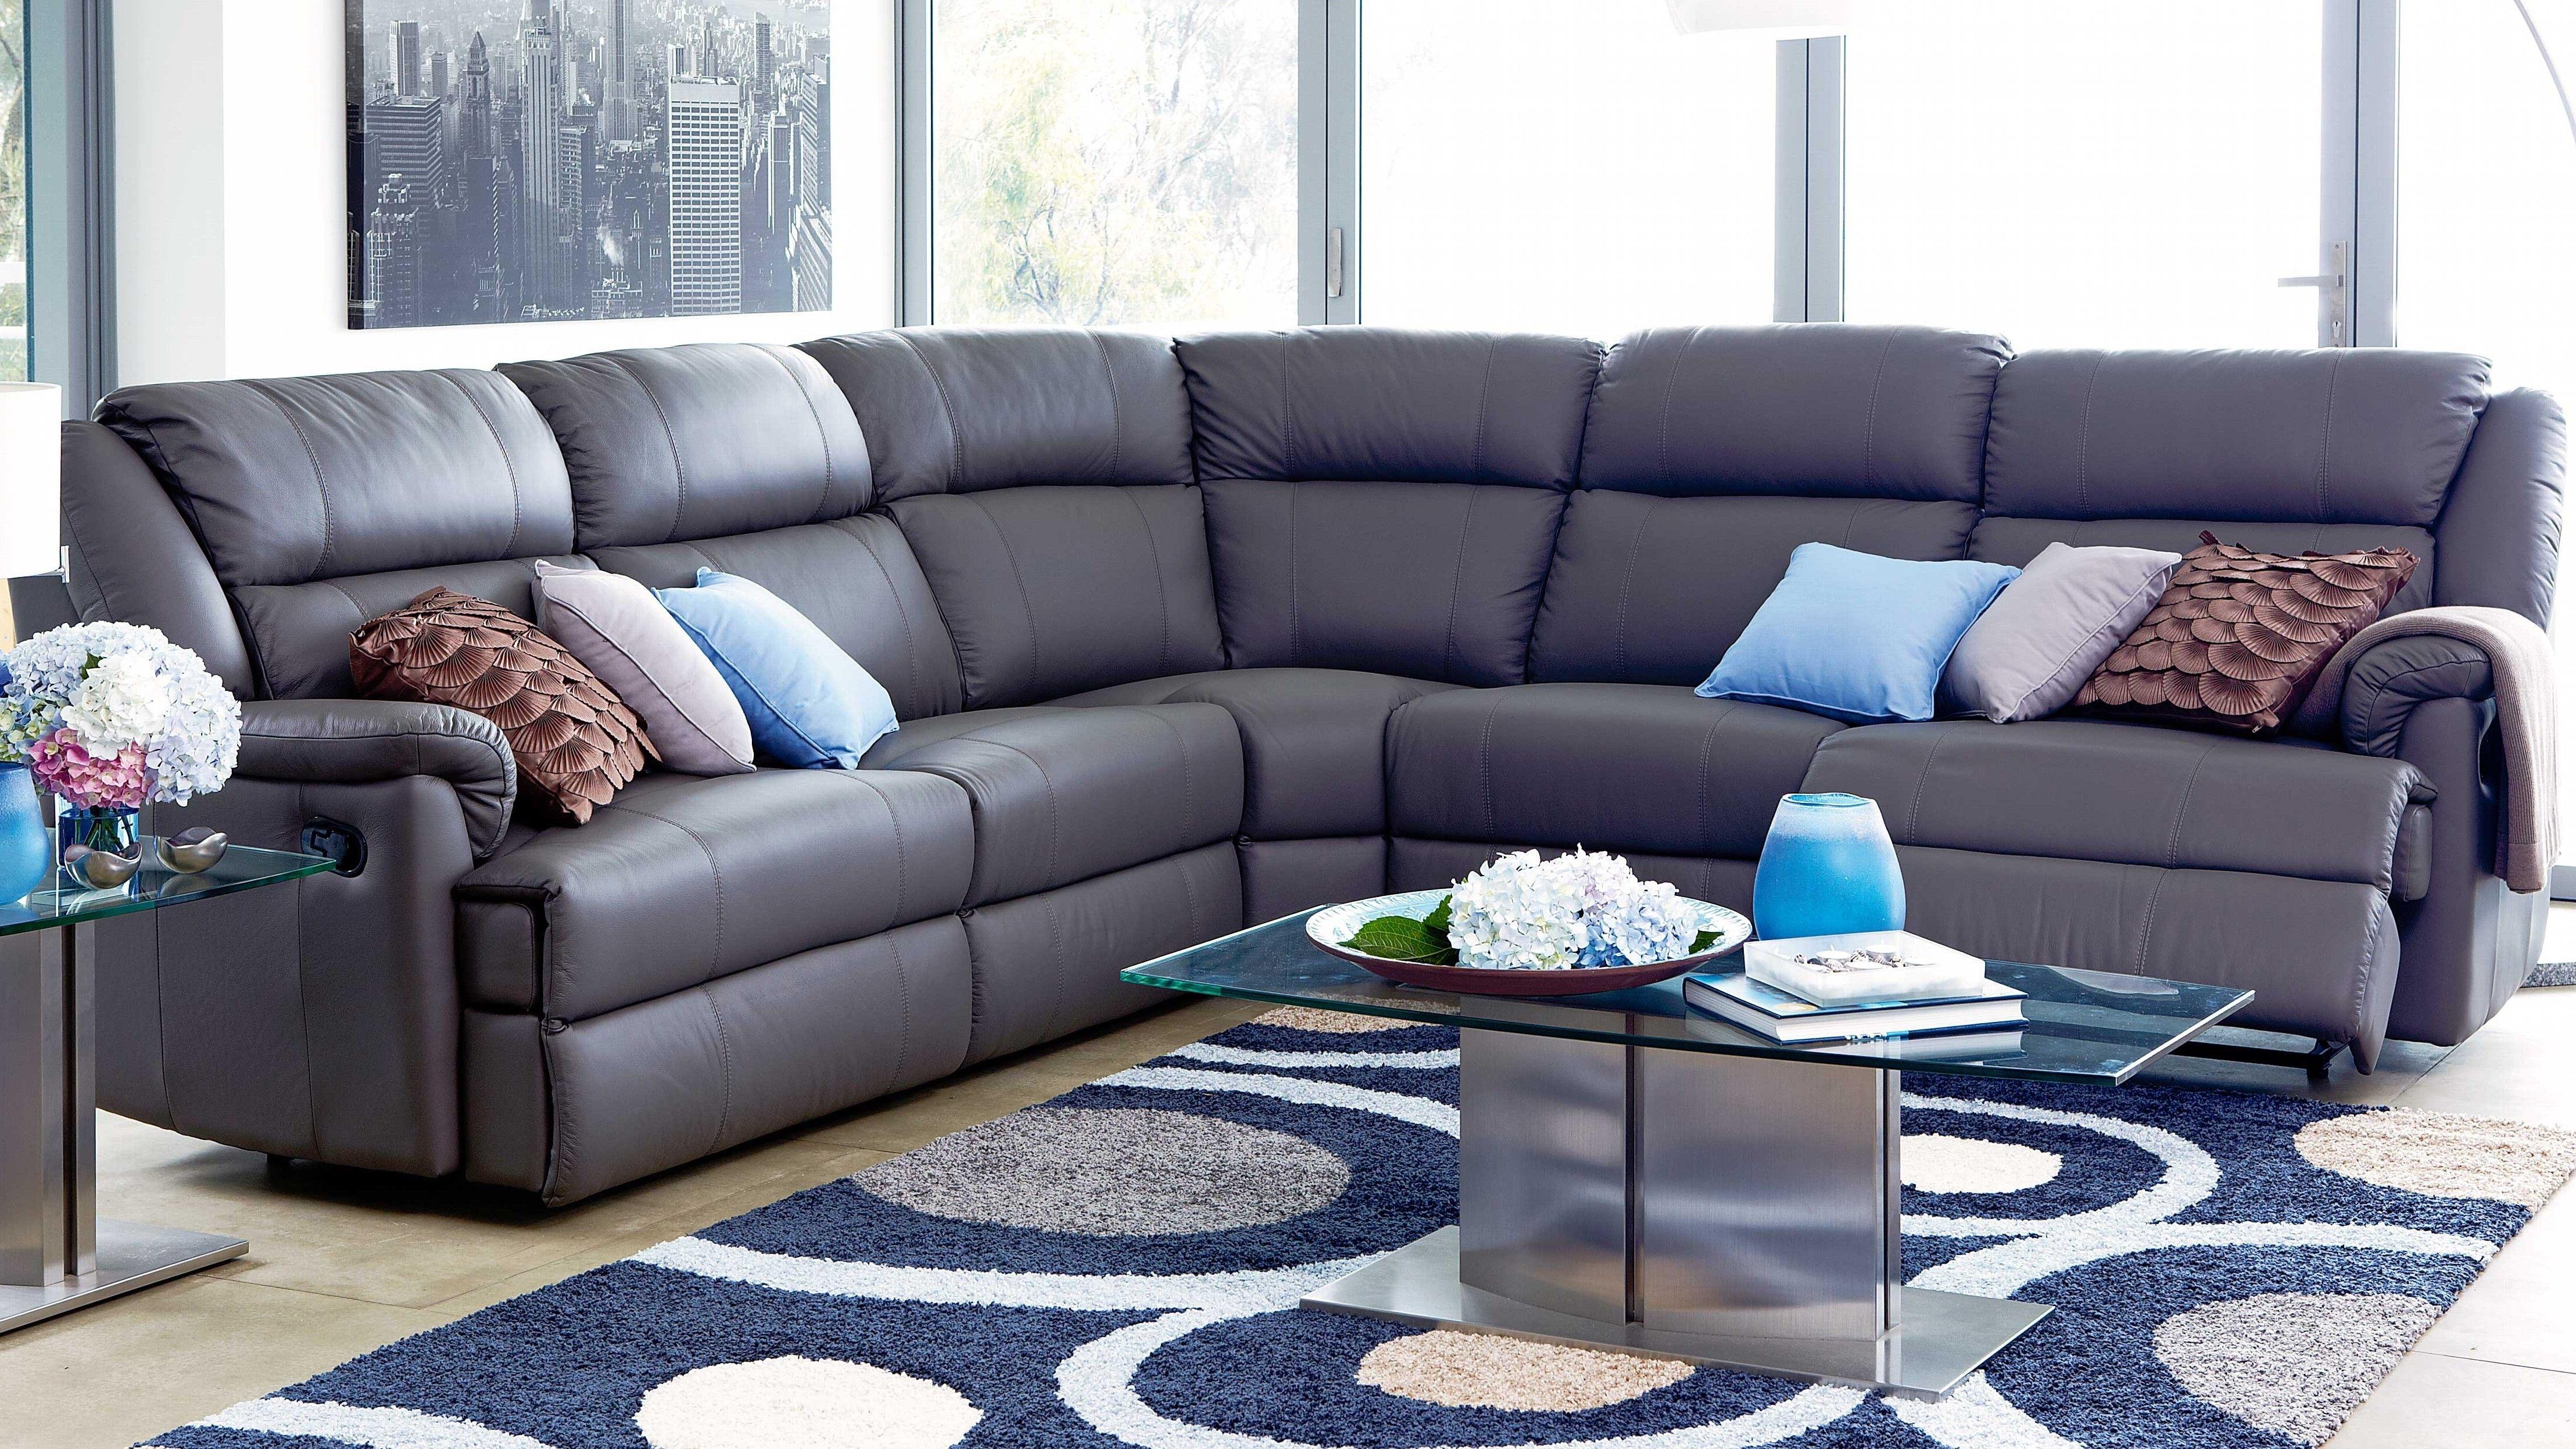 Kato Leather Modular Lounge Suite | Home Ideas | Pinterest